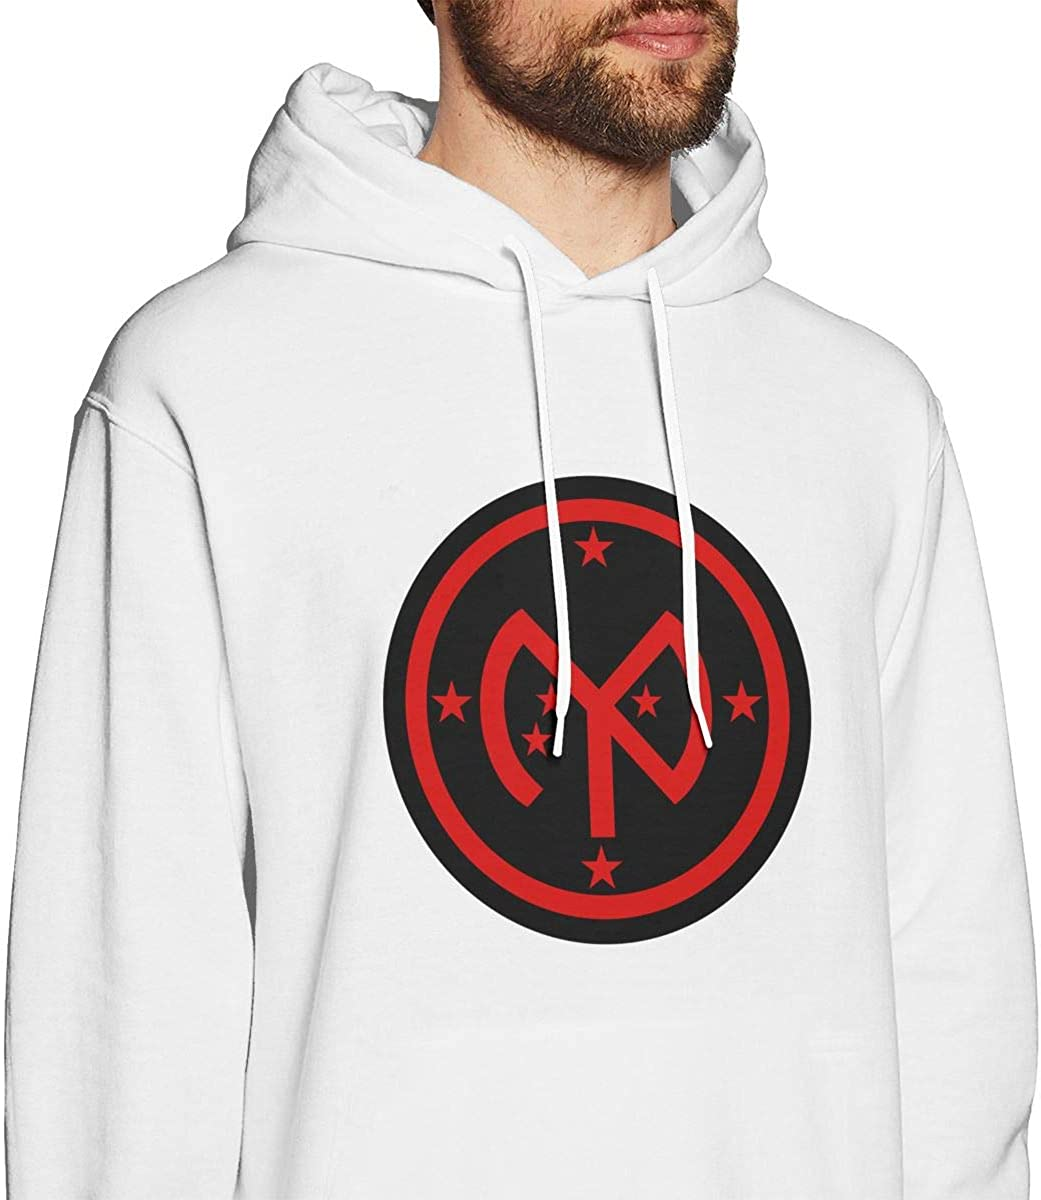 27th Infantry Division SSI Mens Hooded Sweatshirt Theme Printed Fashion Hoodie